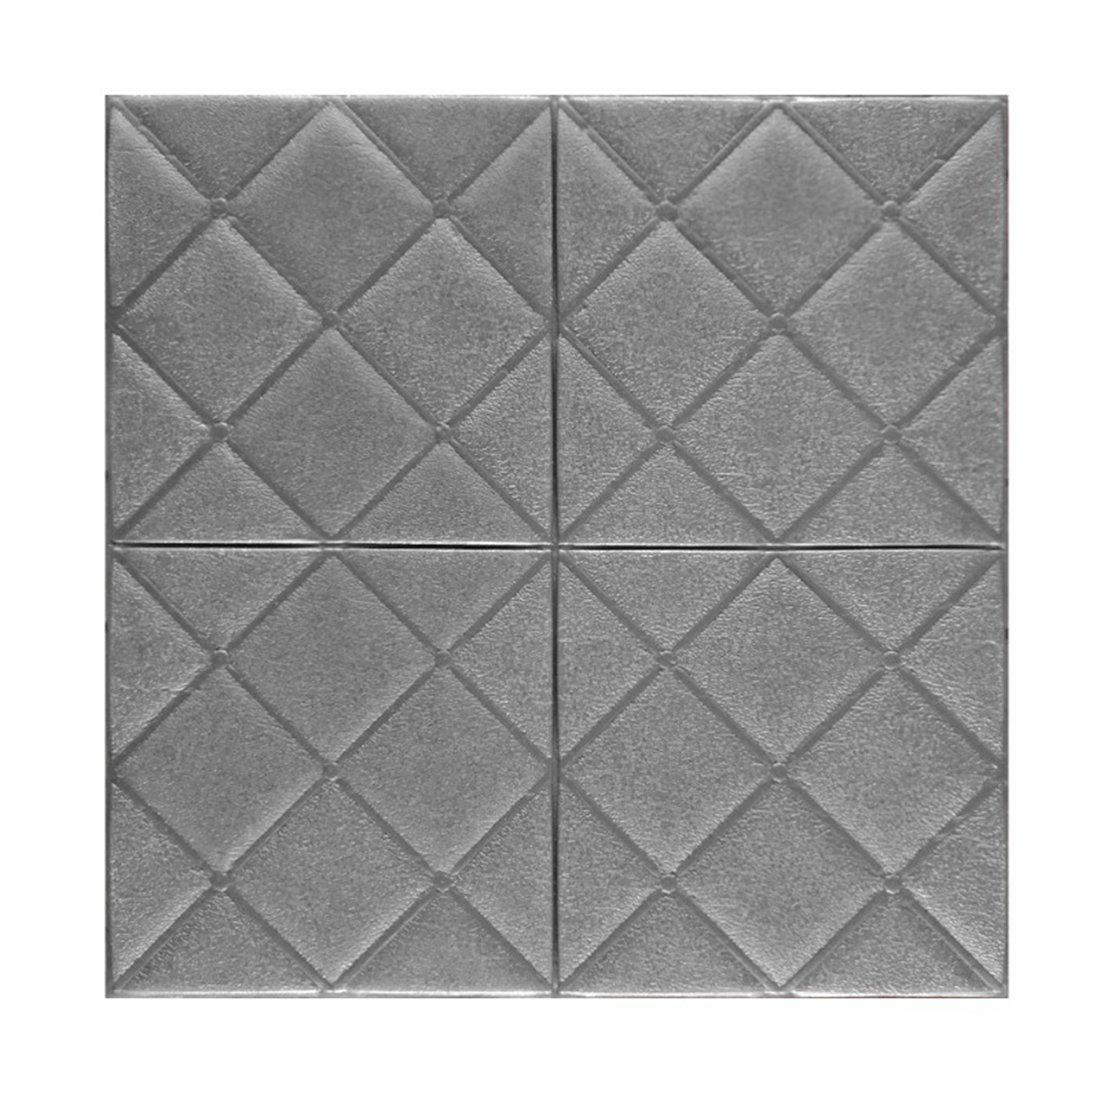 (Enerhu)3D壁紙 3D壁紙パネル 3Dウォールステッカー 壁紙シール ウォールステッカー DIY 簡単貼付シール 防水 壁紙 健康 補修簡単 ダイヤモンド柄 賃貸OK 幼稚園 60*60cm 5枚入り グレー B07DS67ZJF 13770 60*60cm(5枚入り)|グレー グレー 60*60cm(5枚入り)